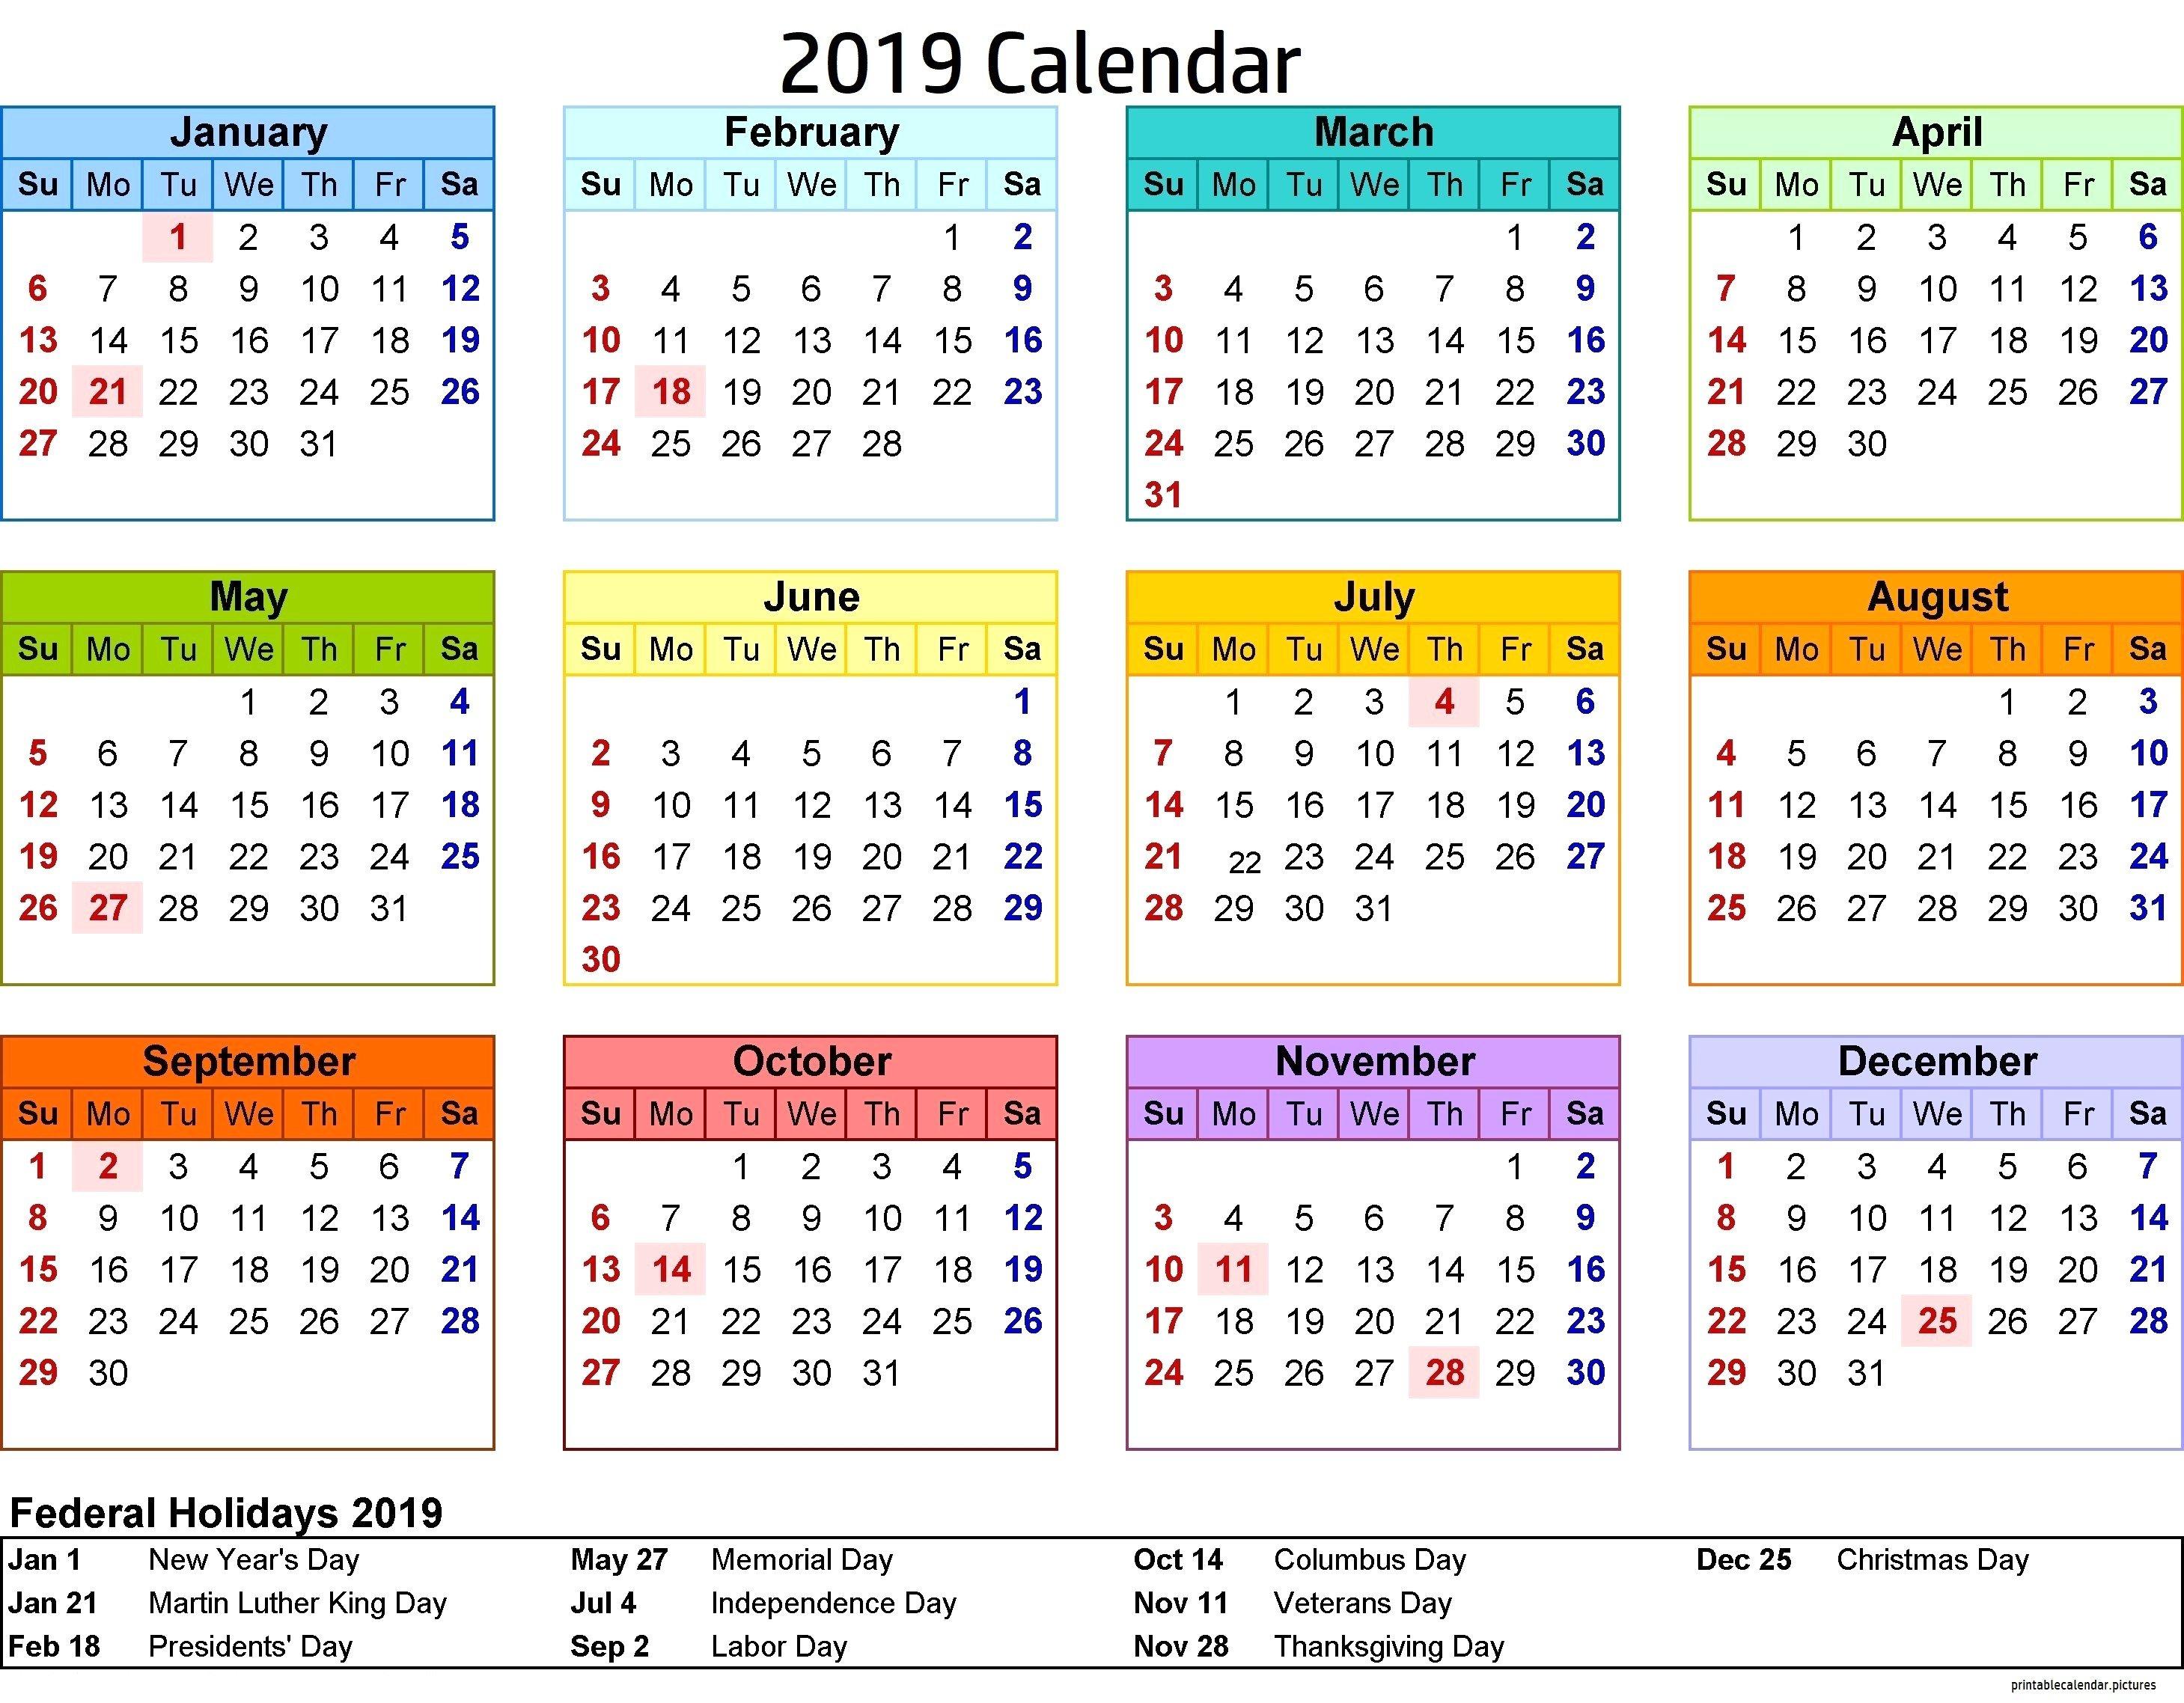 2019 Calendar Philippines With Holidays | Jcreview Calendar 2019 Near Me